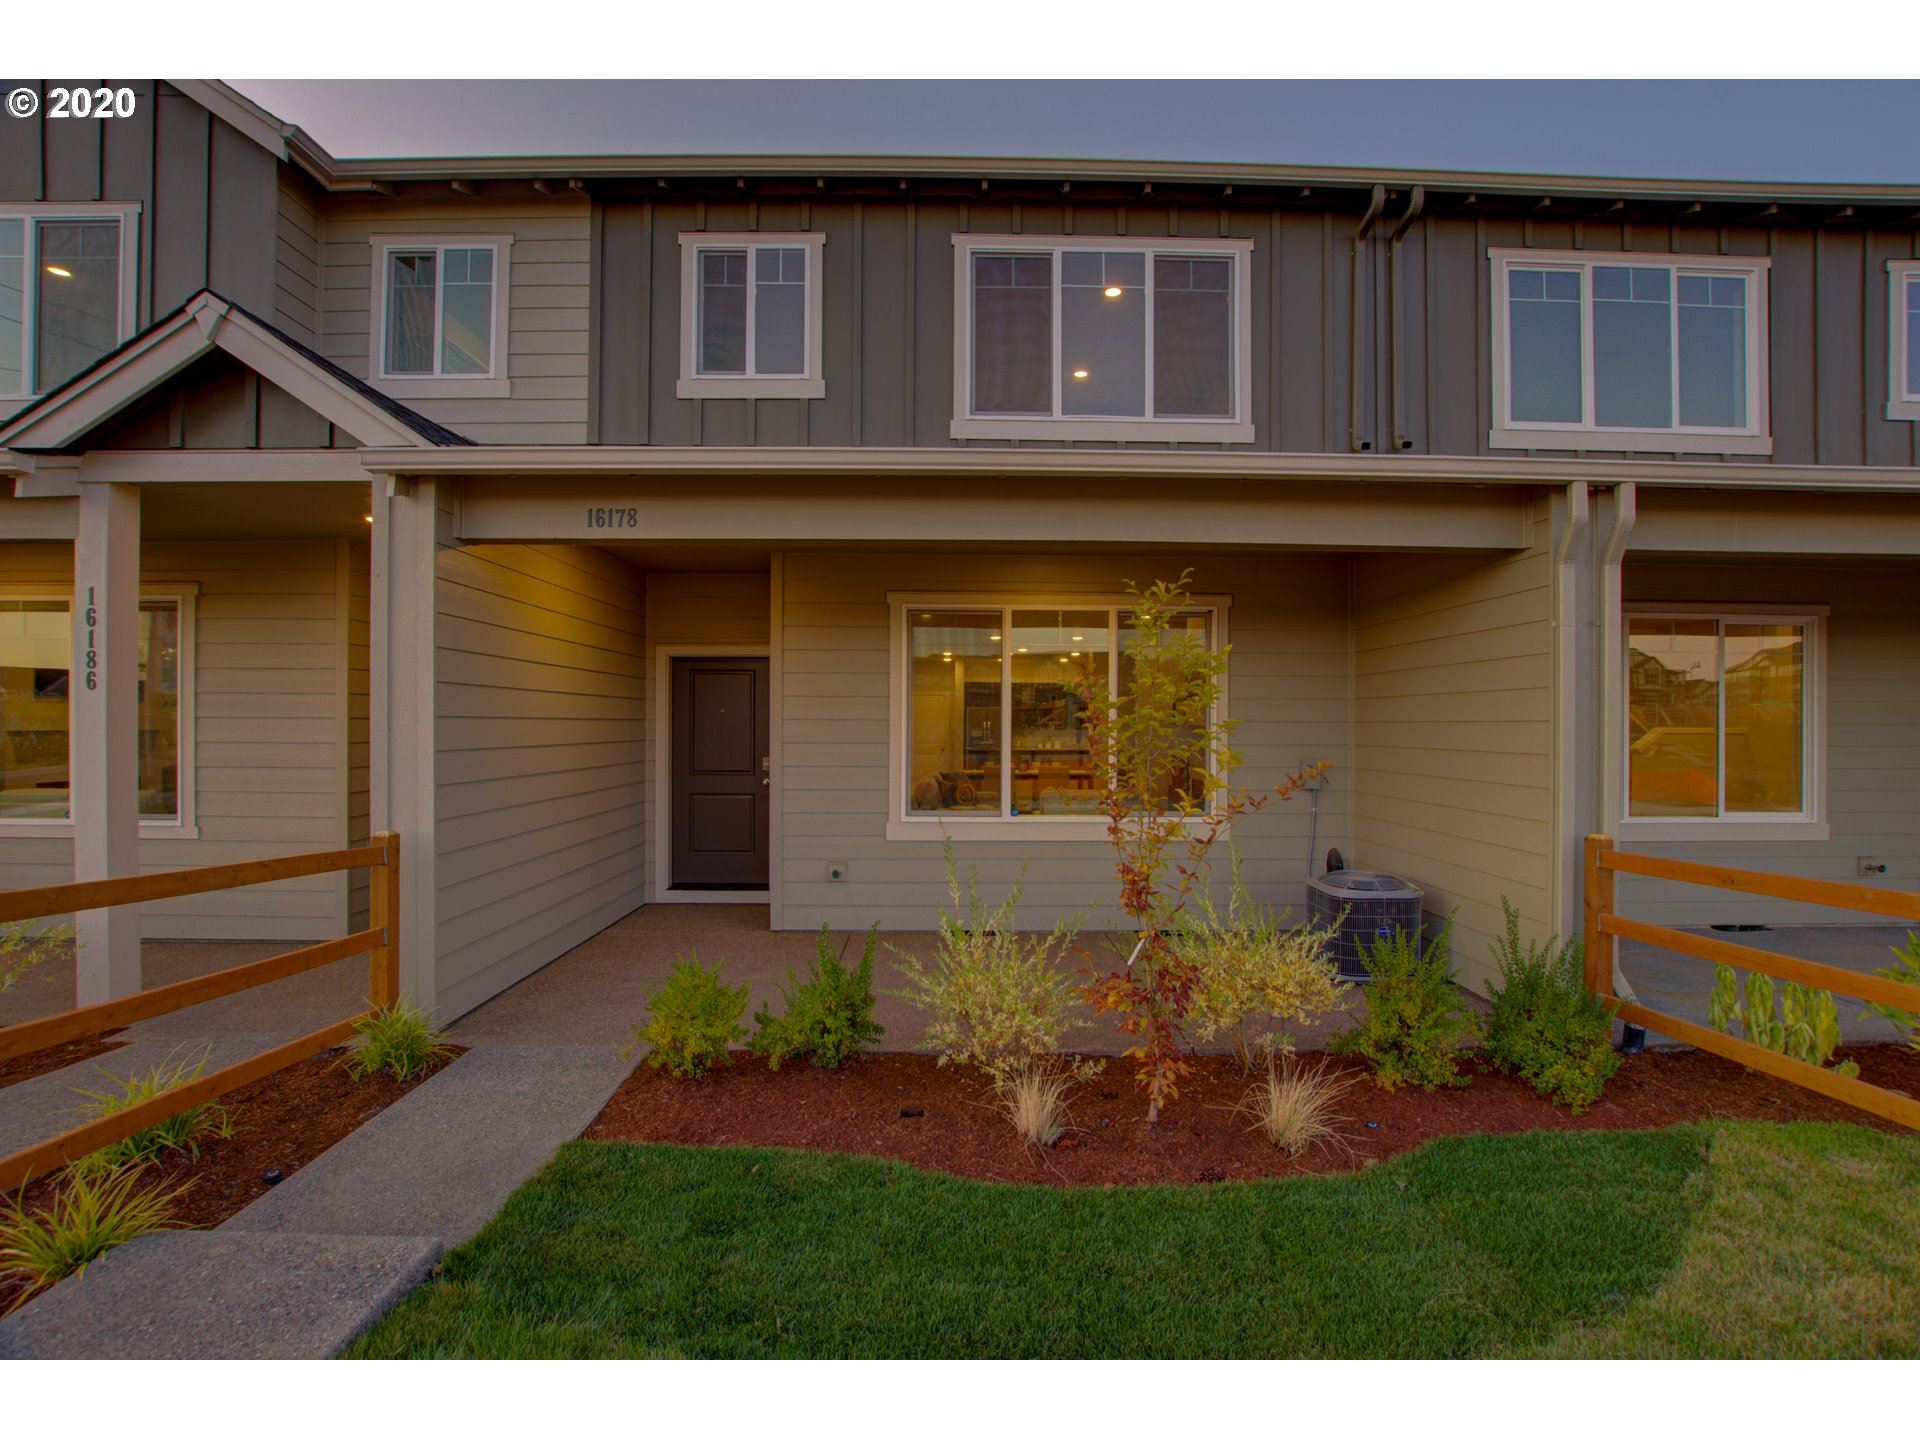 16175 NW PRISTINE LN, Portland, OR 97229 - MLS#: 20327472